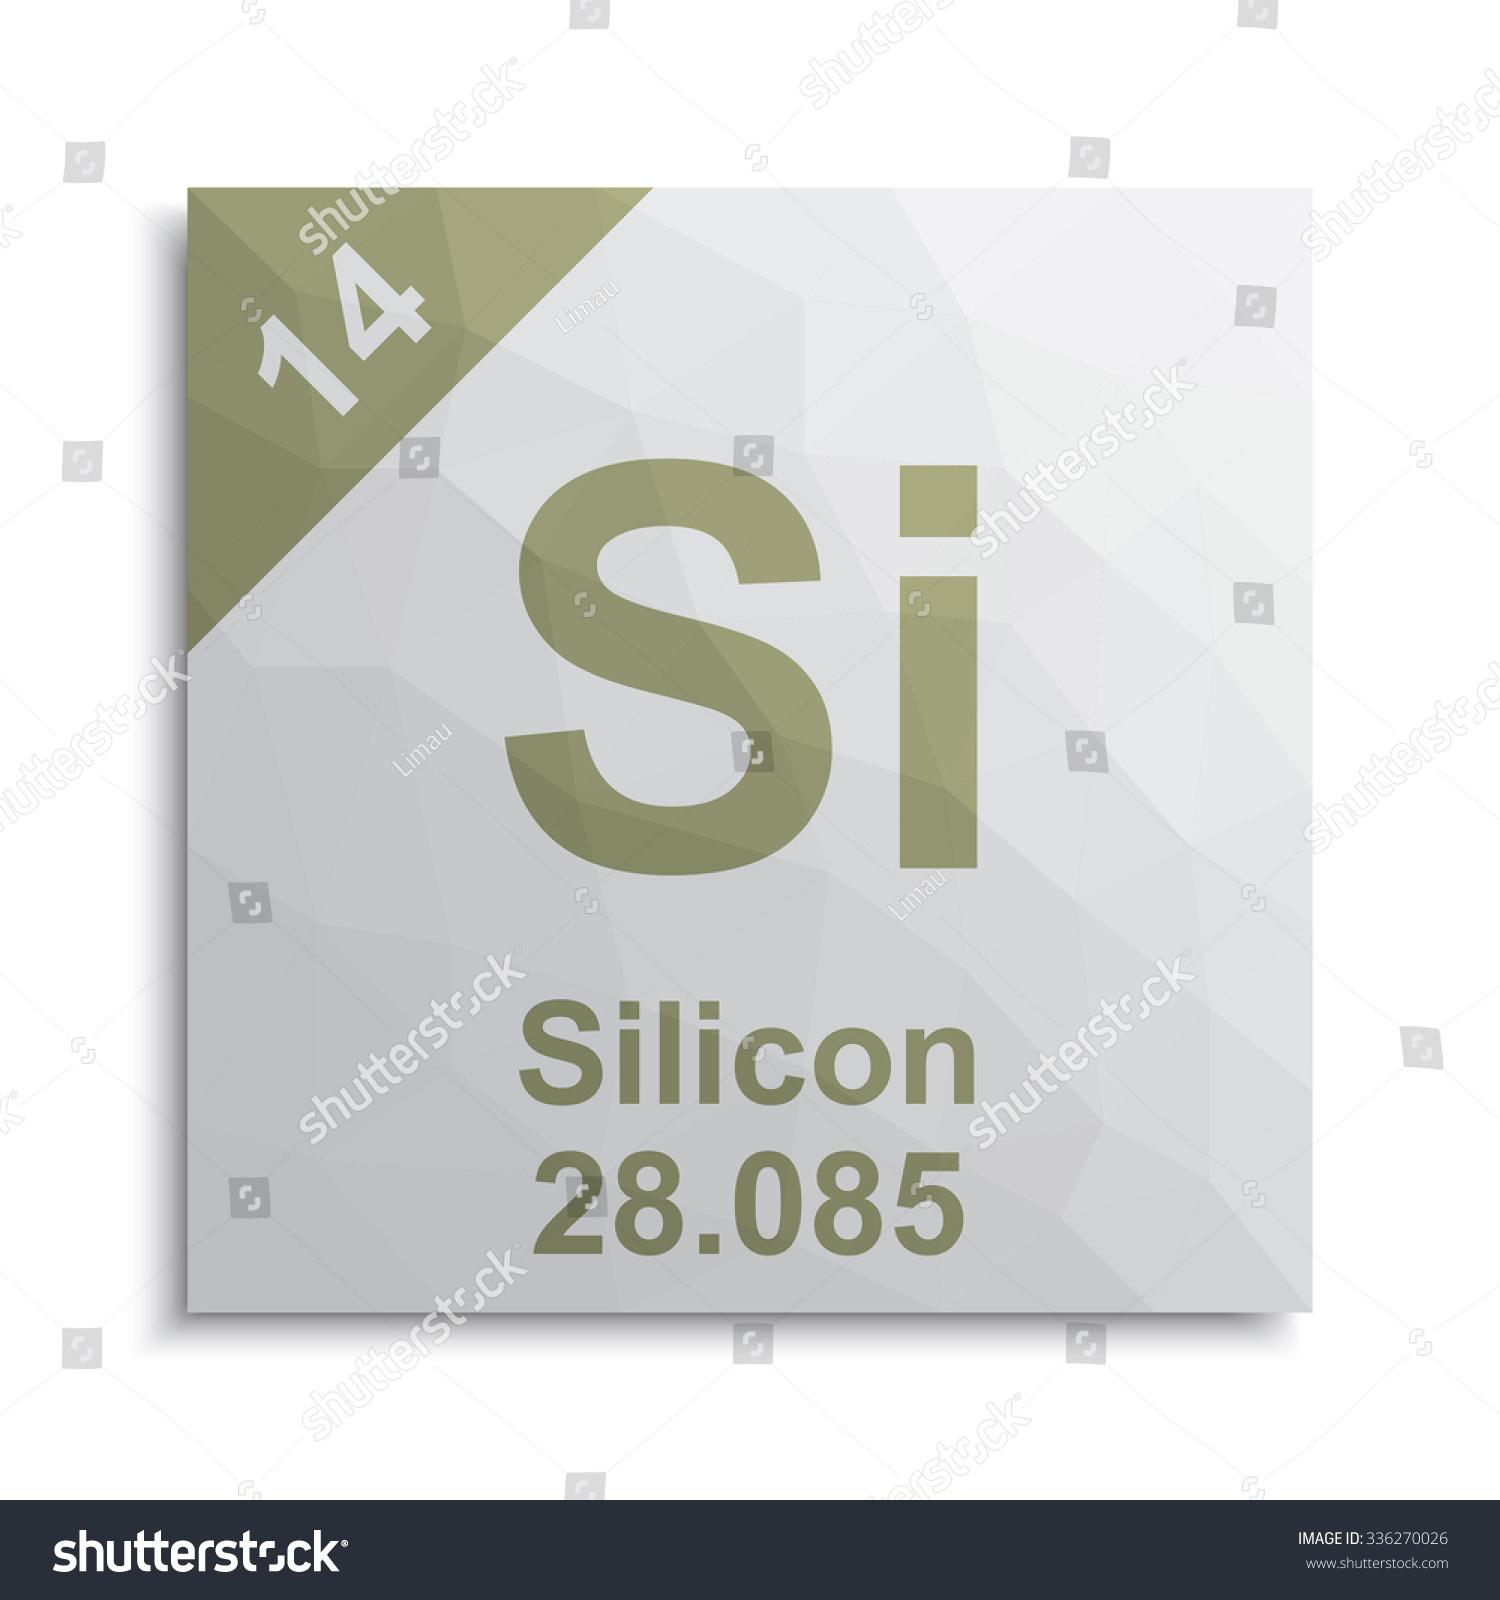 Silicon element periodic table stock vector 336270026 shutterstock silicon element periodic table buycottarizona